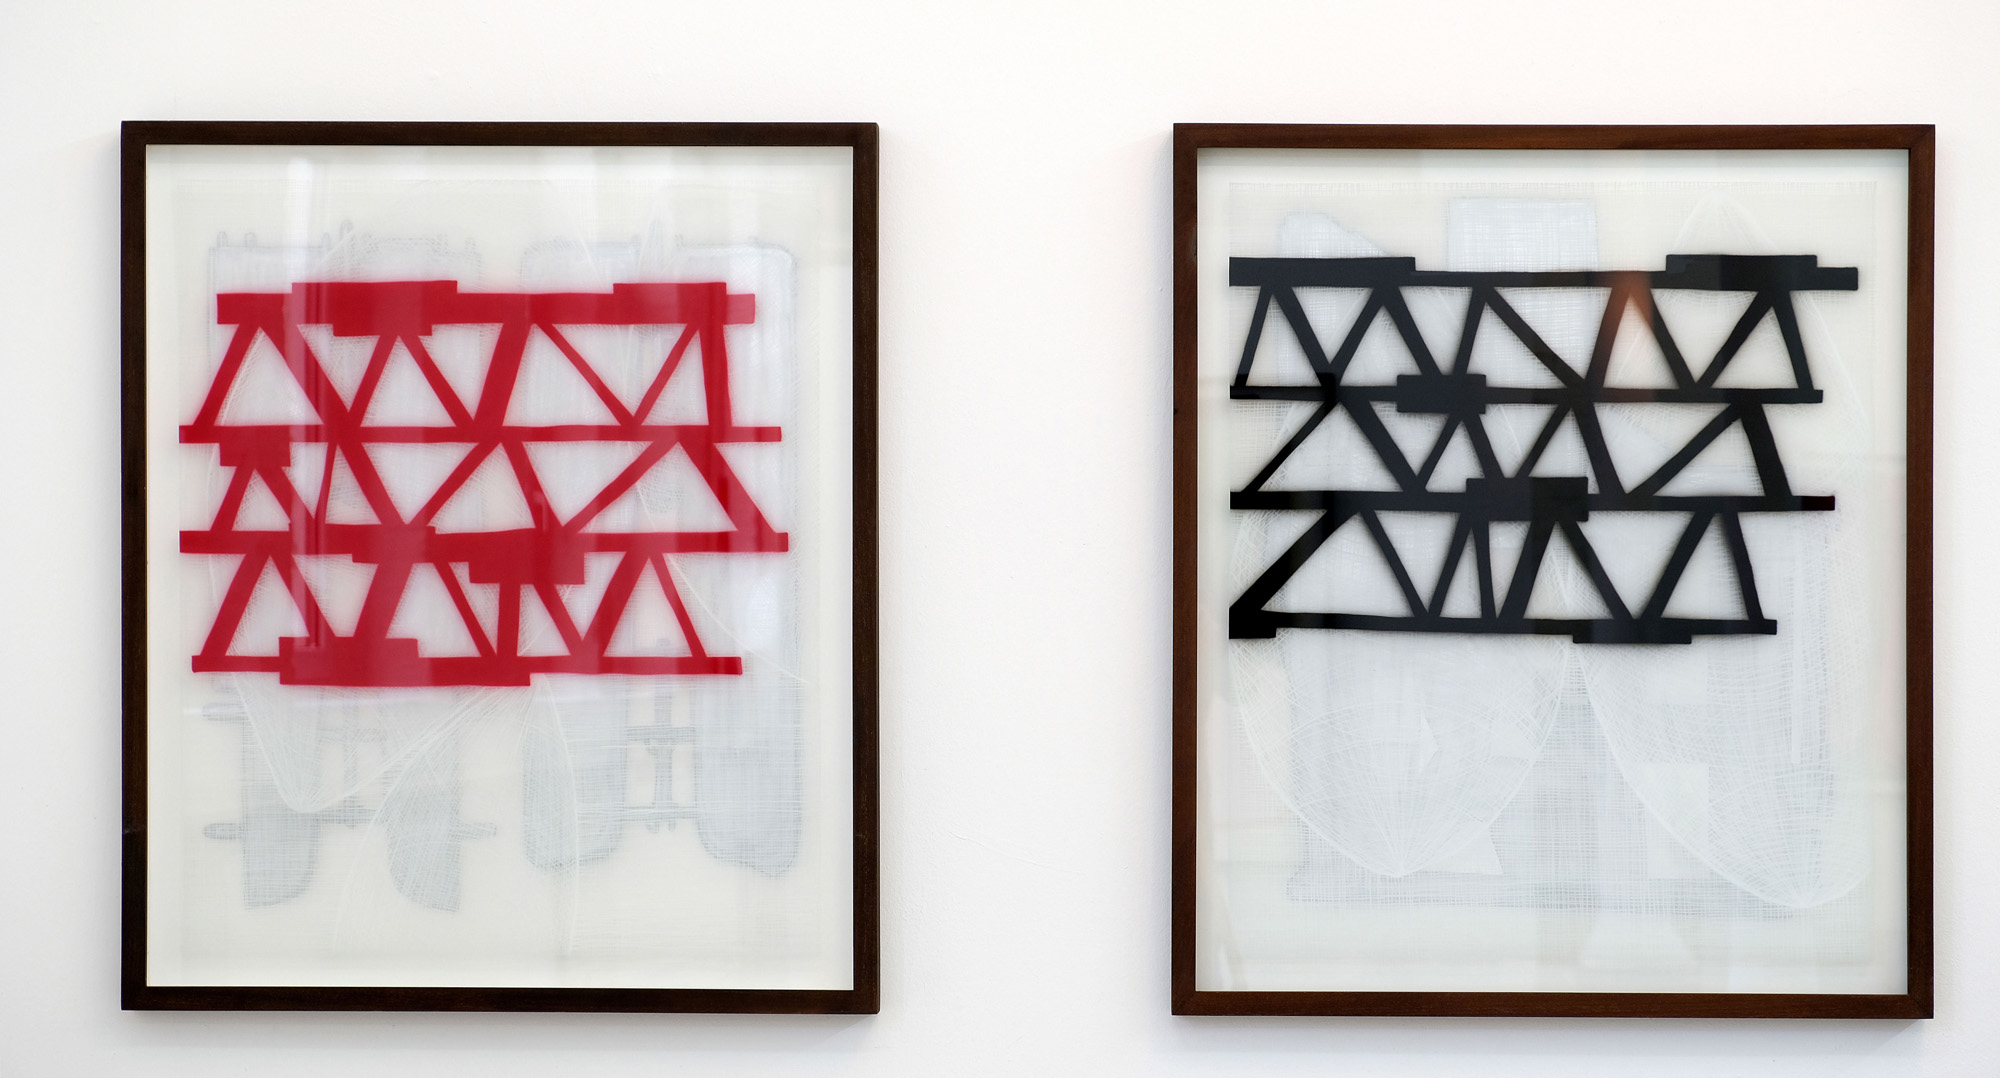 Links: Re-Entry, 110 x 94 cm, 2011; Rechts: The Ark, 110 x 94 cm, 2011